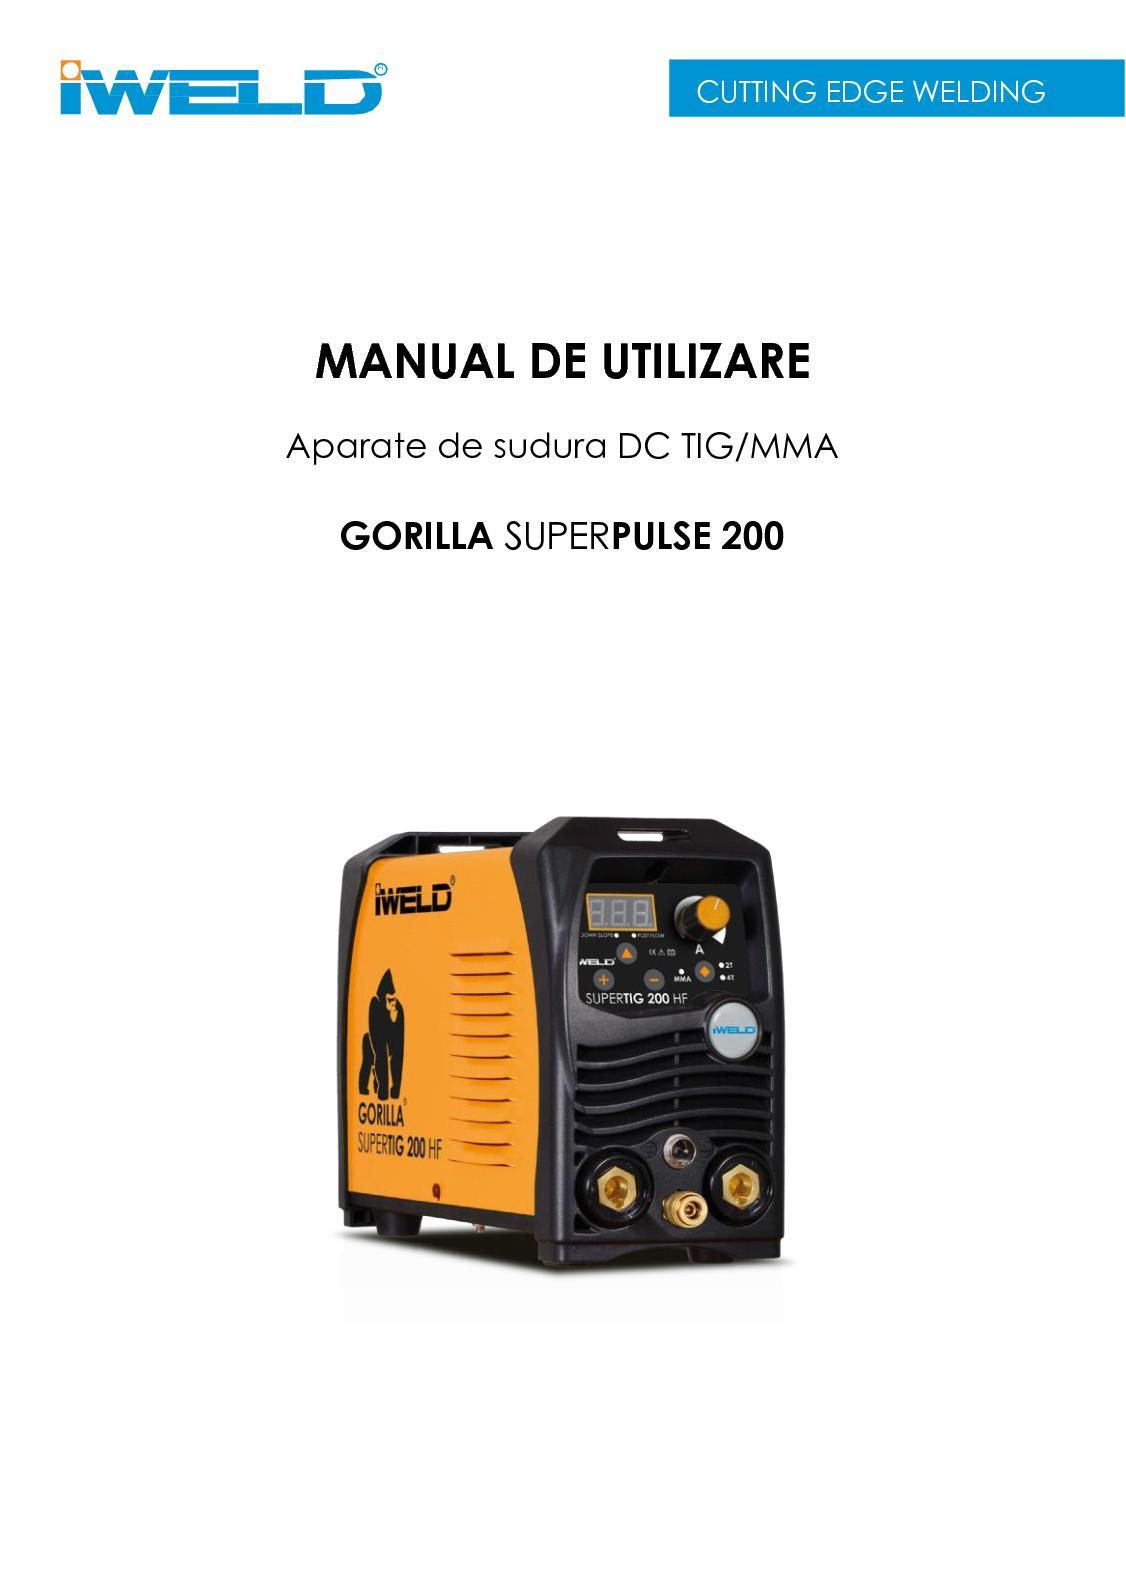 Calaméo - Manual Gorilla Tig Superpulse 200 Ro